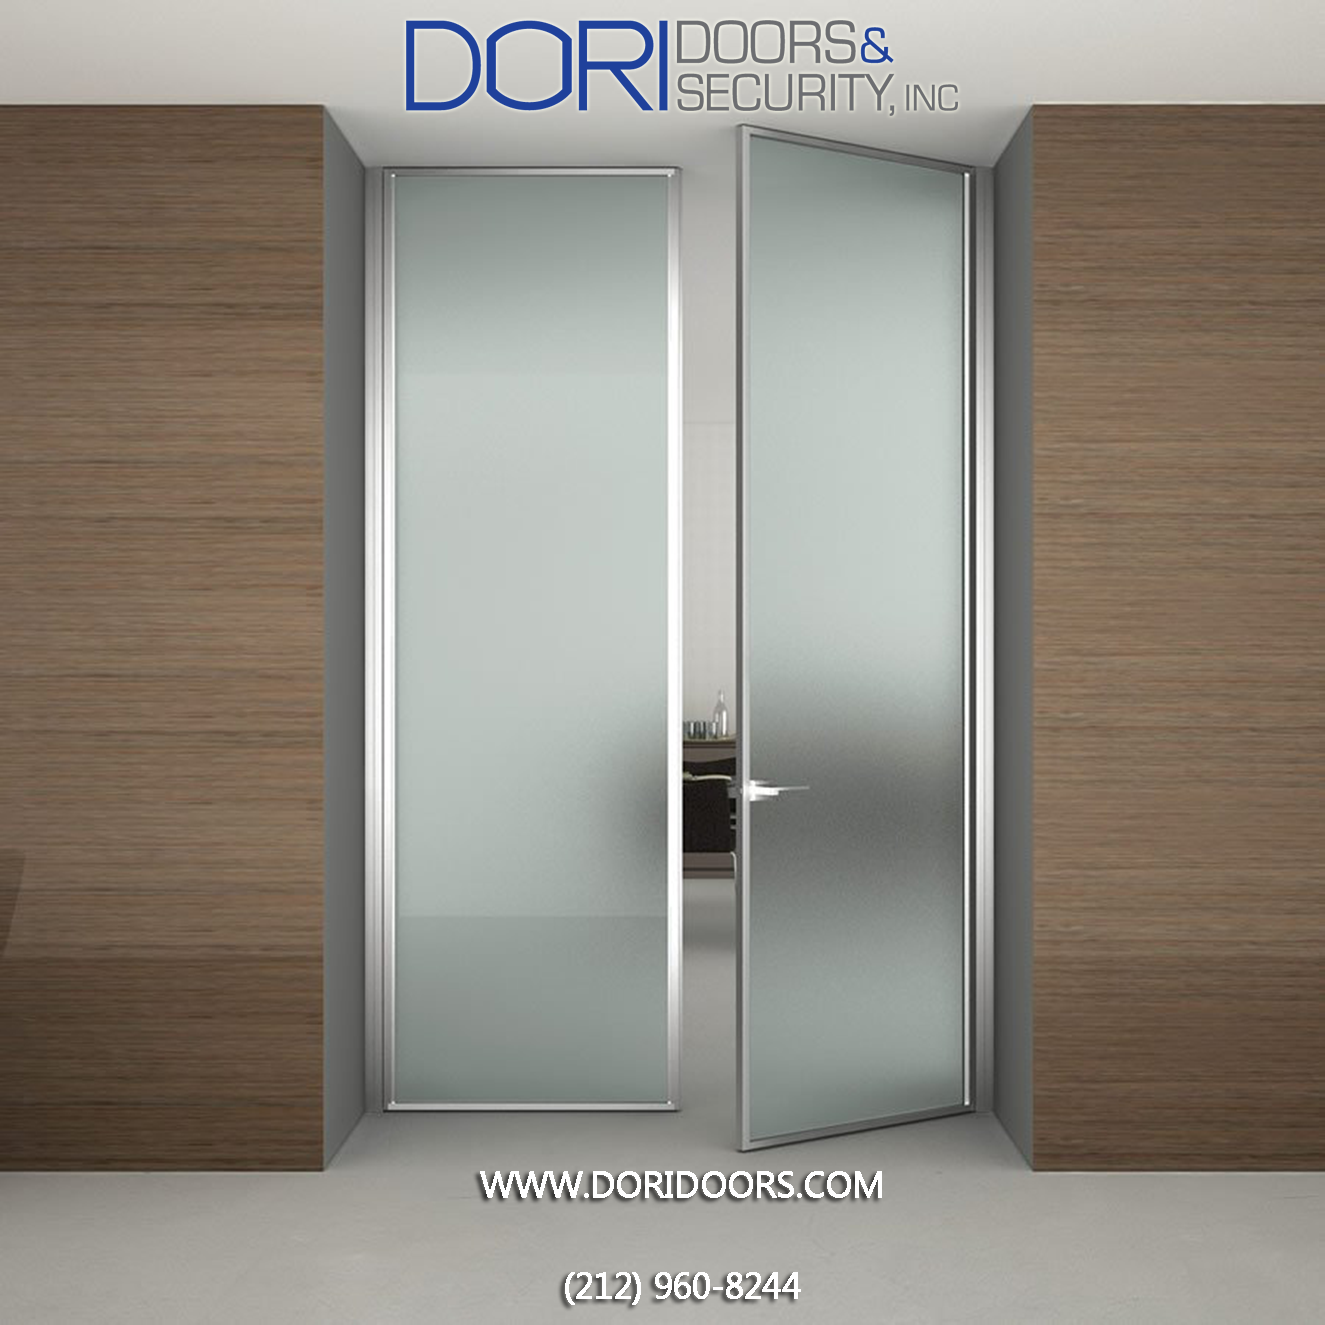 Dori Doors Security Inc Provides Full Service Design